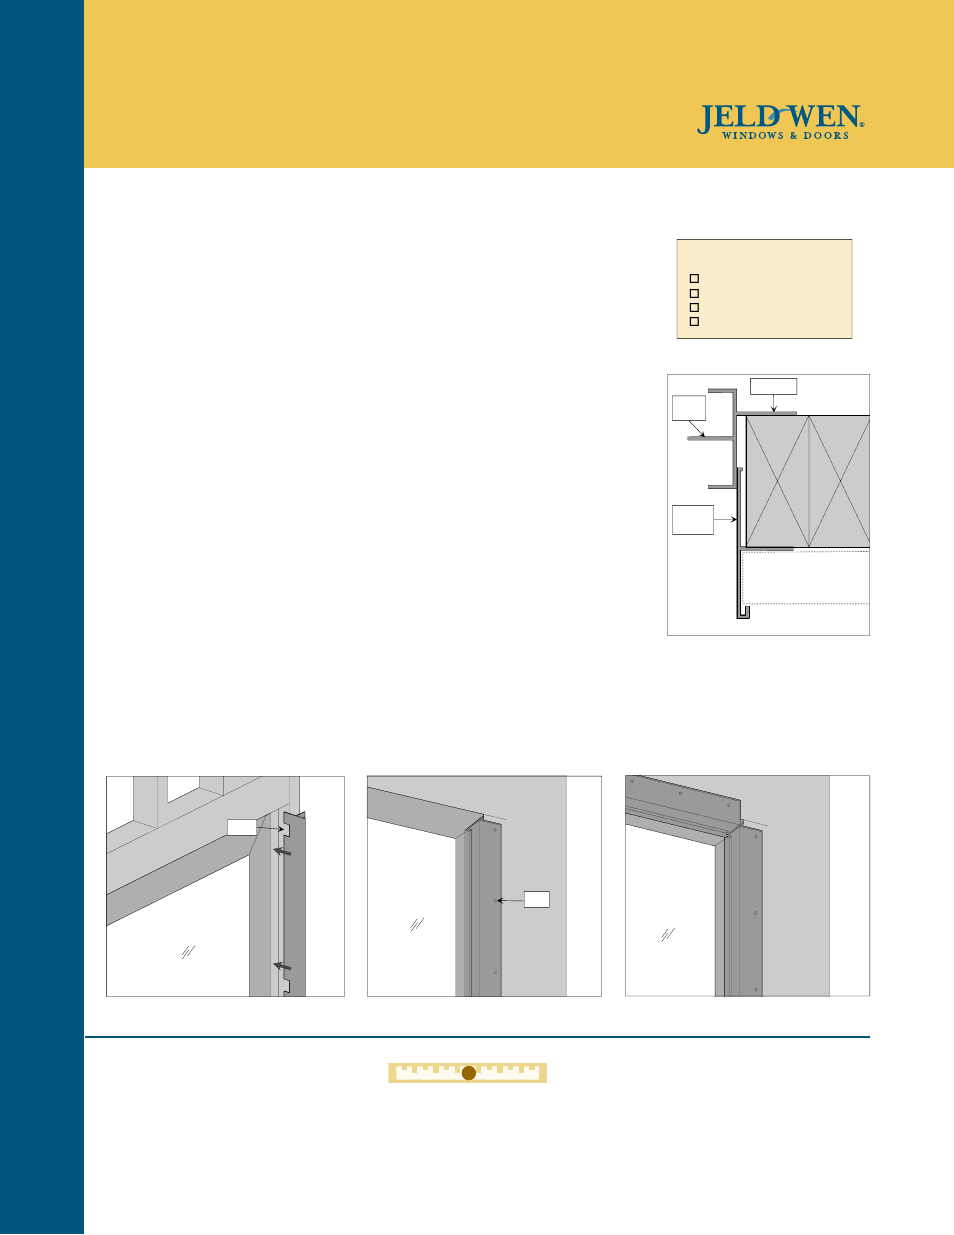 JELD WEN SIV002 Aluminum Extension Jamb For Vinyl Patio Doors User Manual |  1 Page